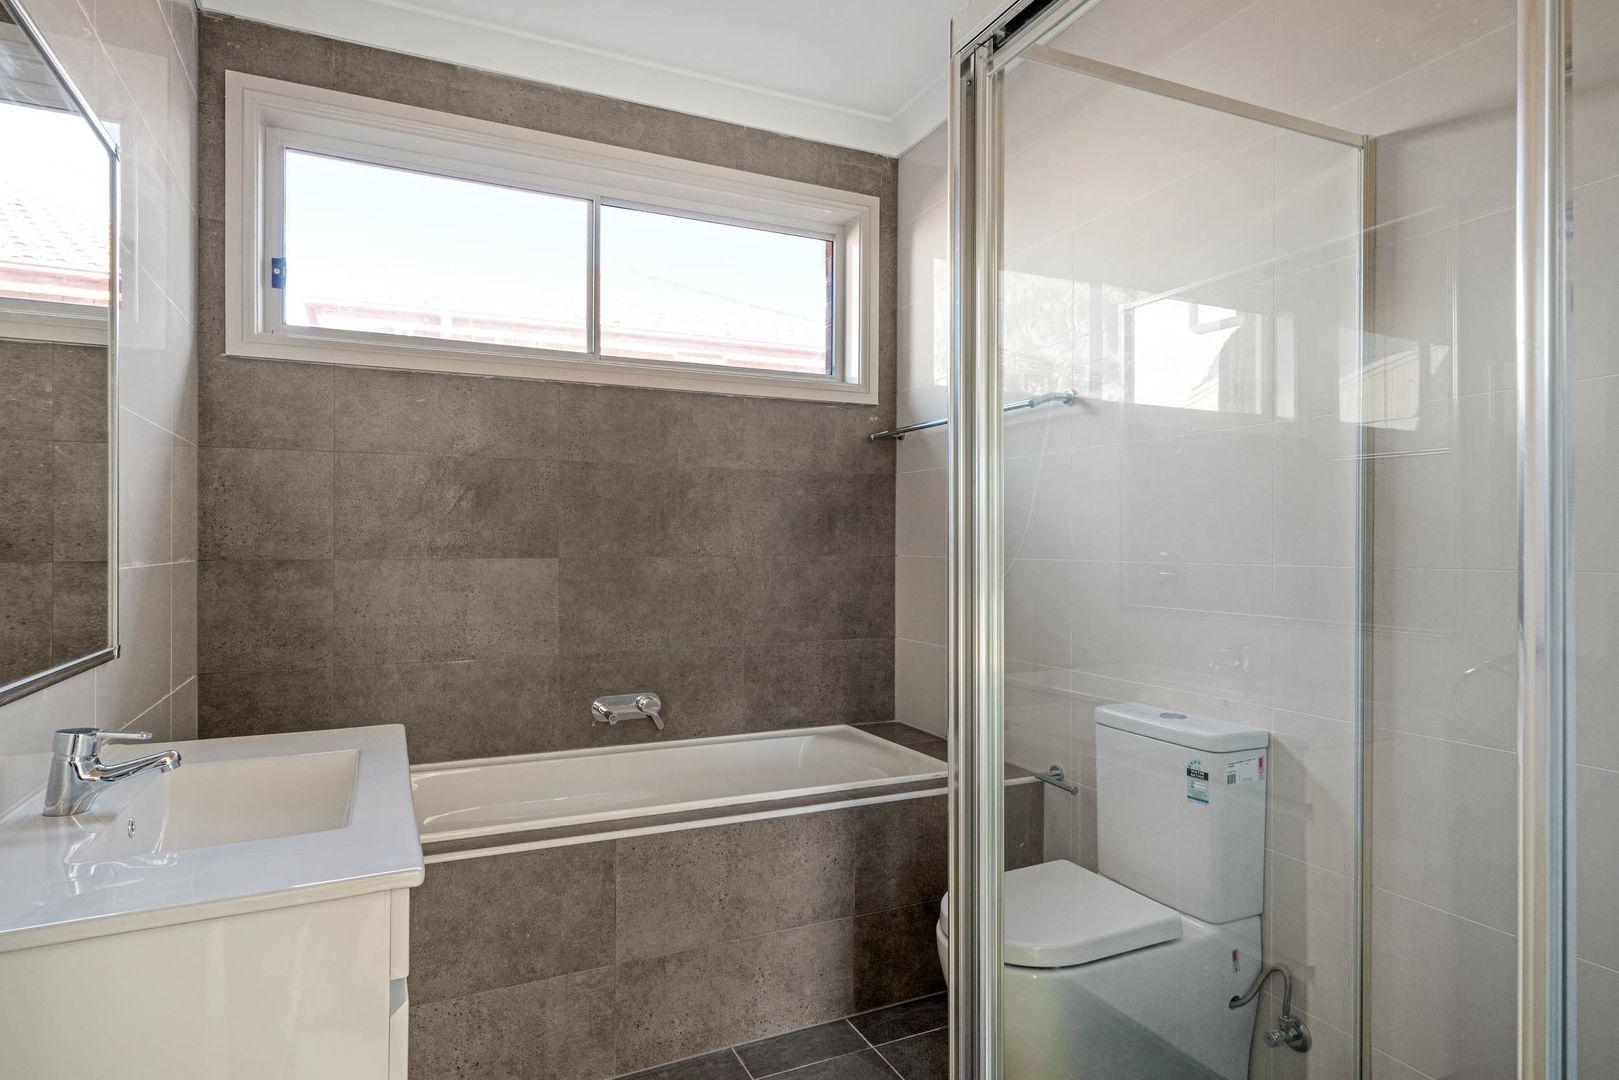 1/155 Girraween Rd, Girraween NSW 2145, Image 0